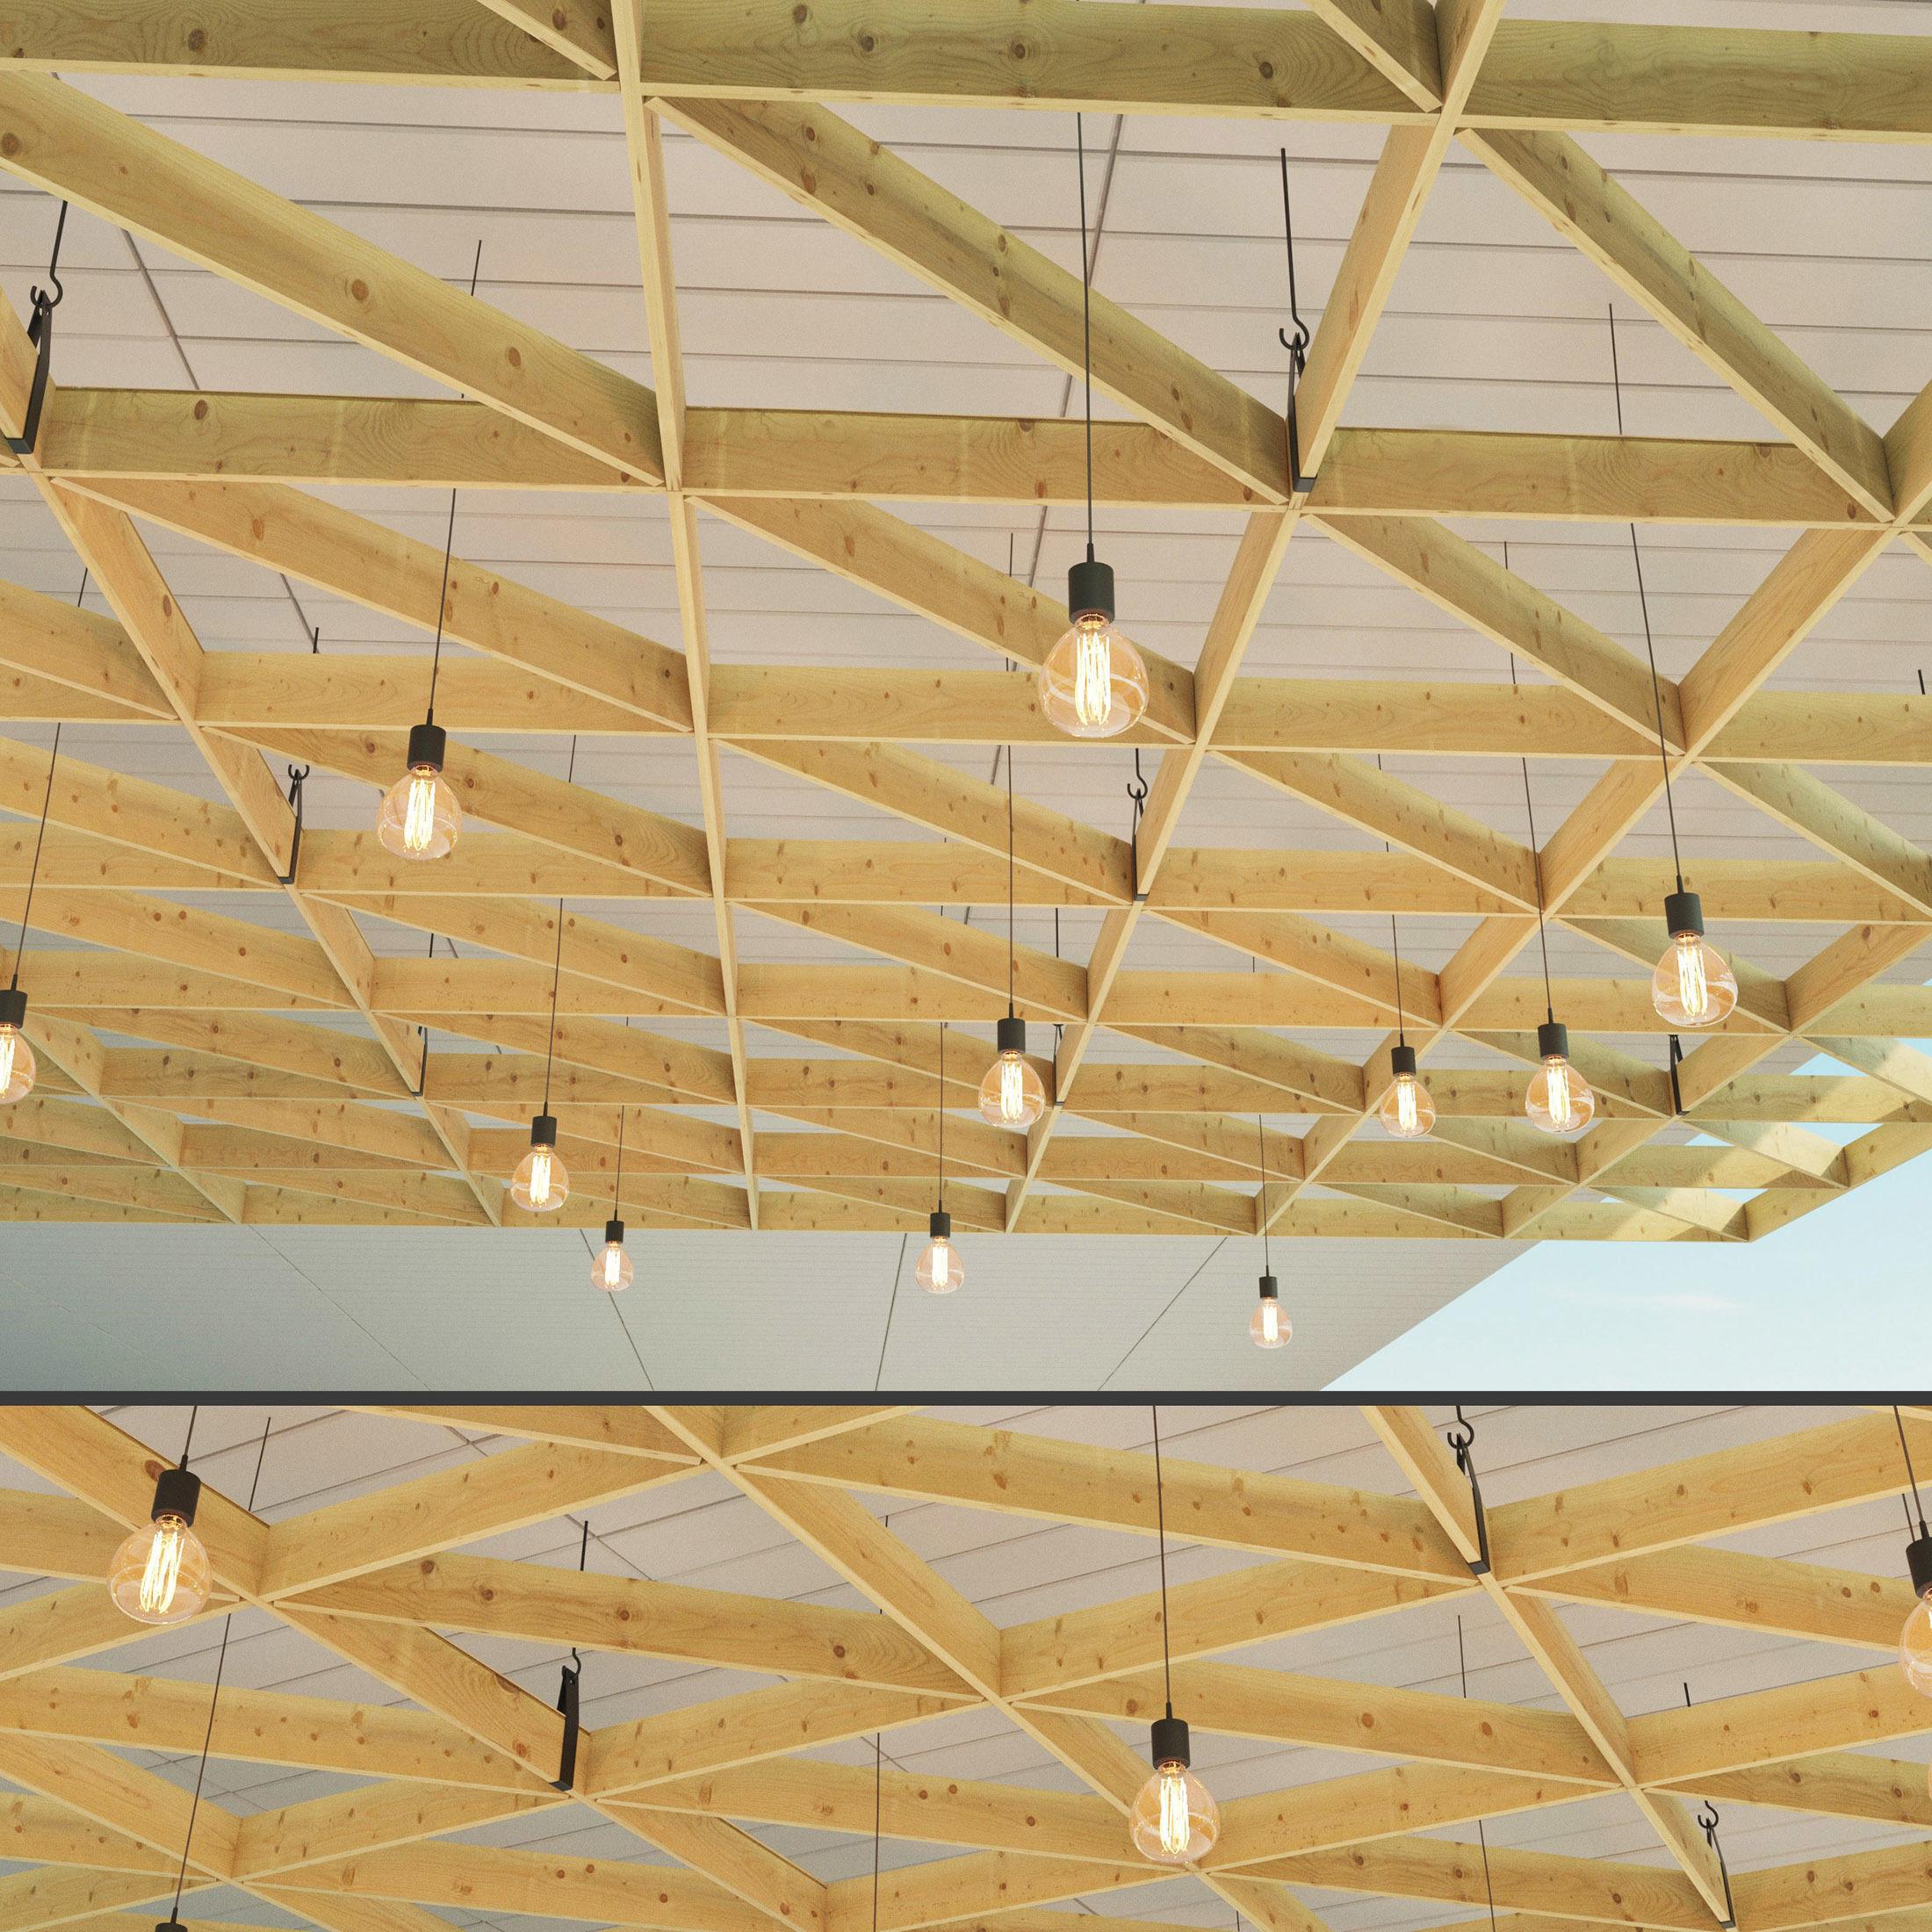 Wooden Suspended Ceiling 3 3d Model